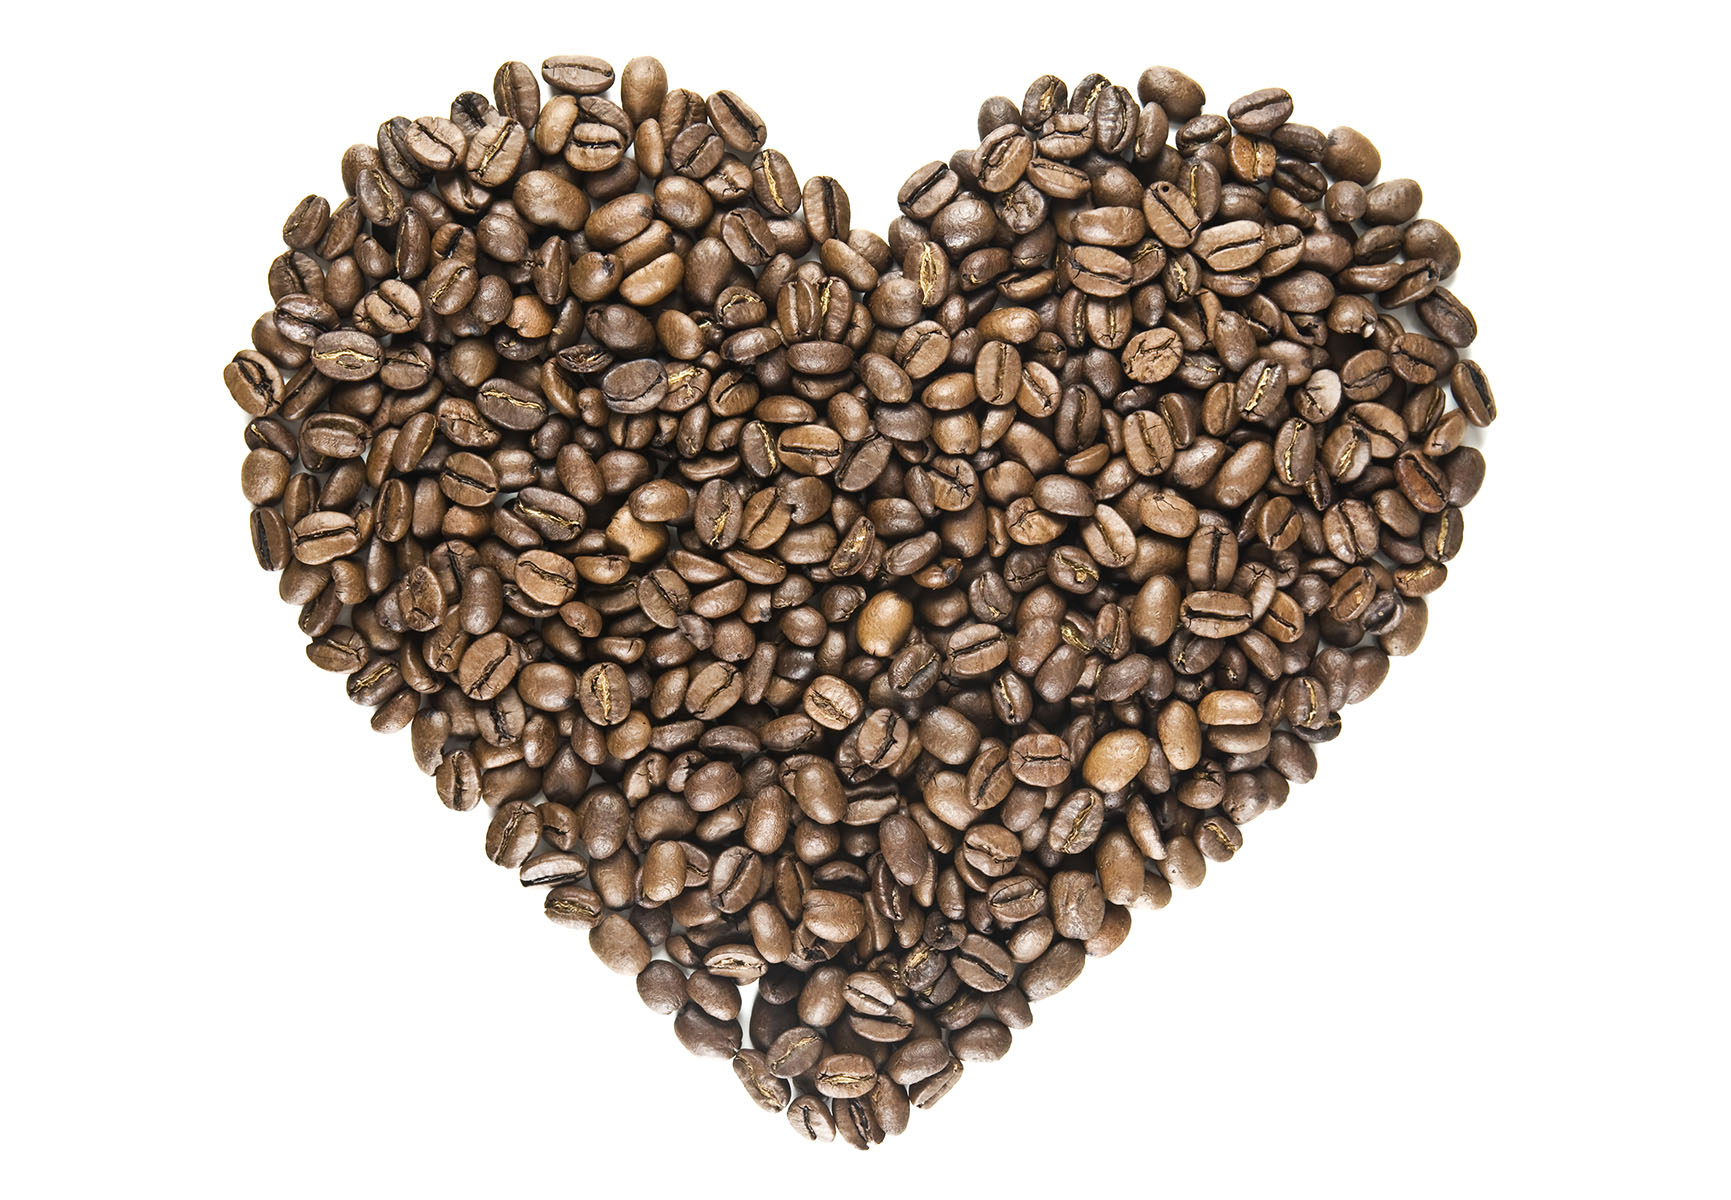 I Love Coffee - heart of roasted bea